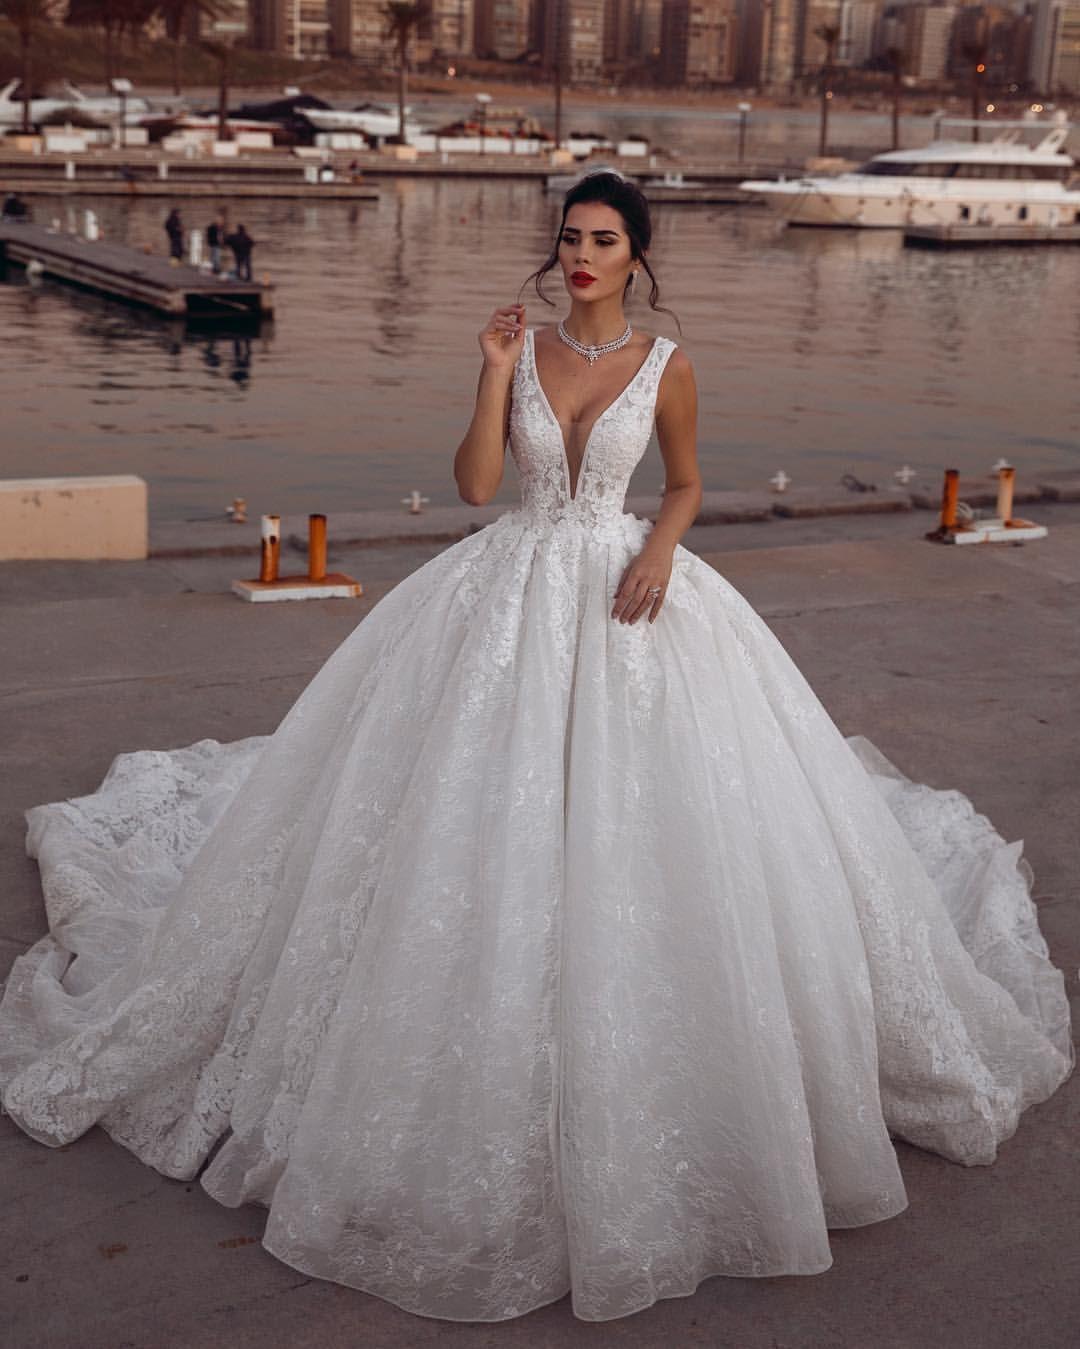 20 Wedding ideas   wedding dresses, bridal dresses, bridal gowns